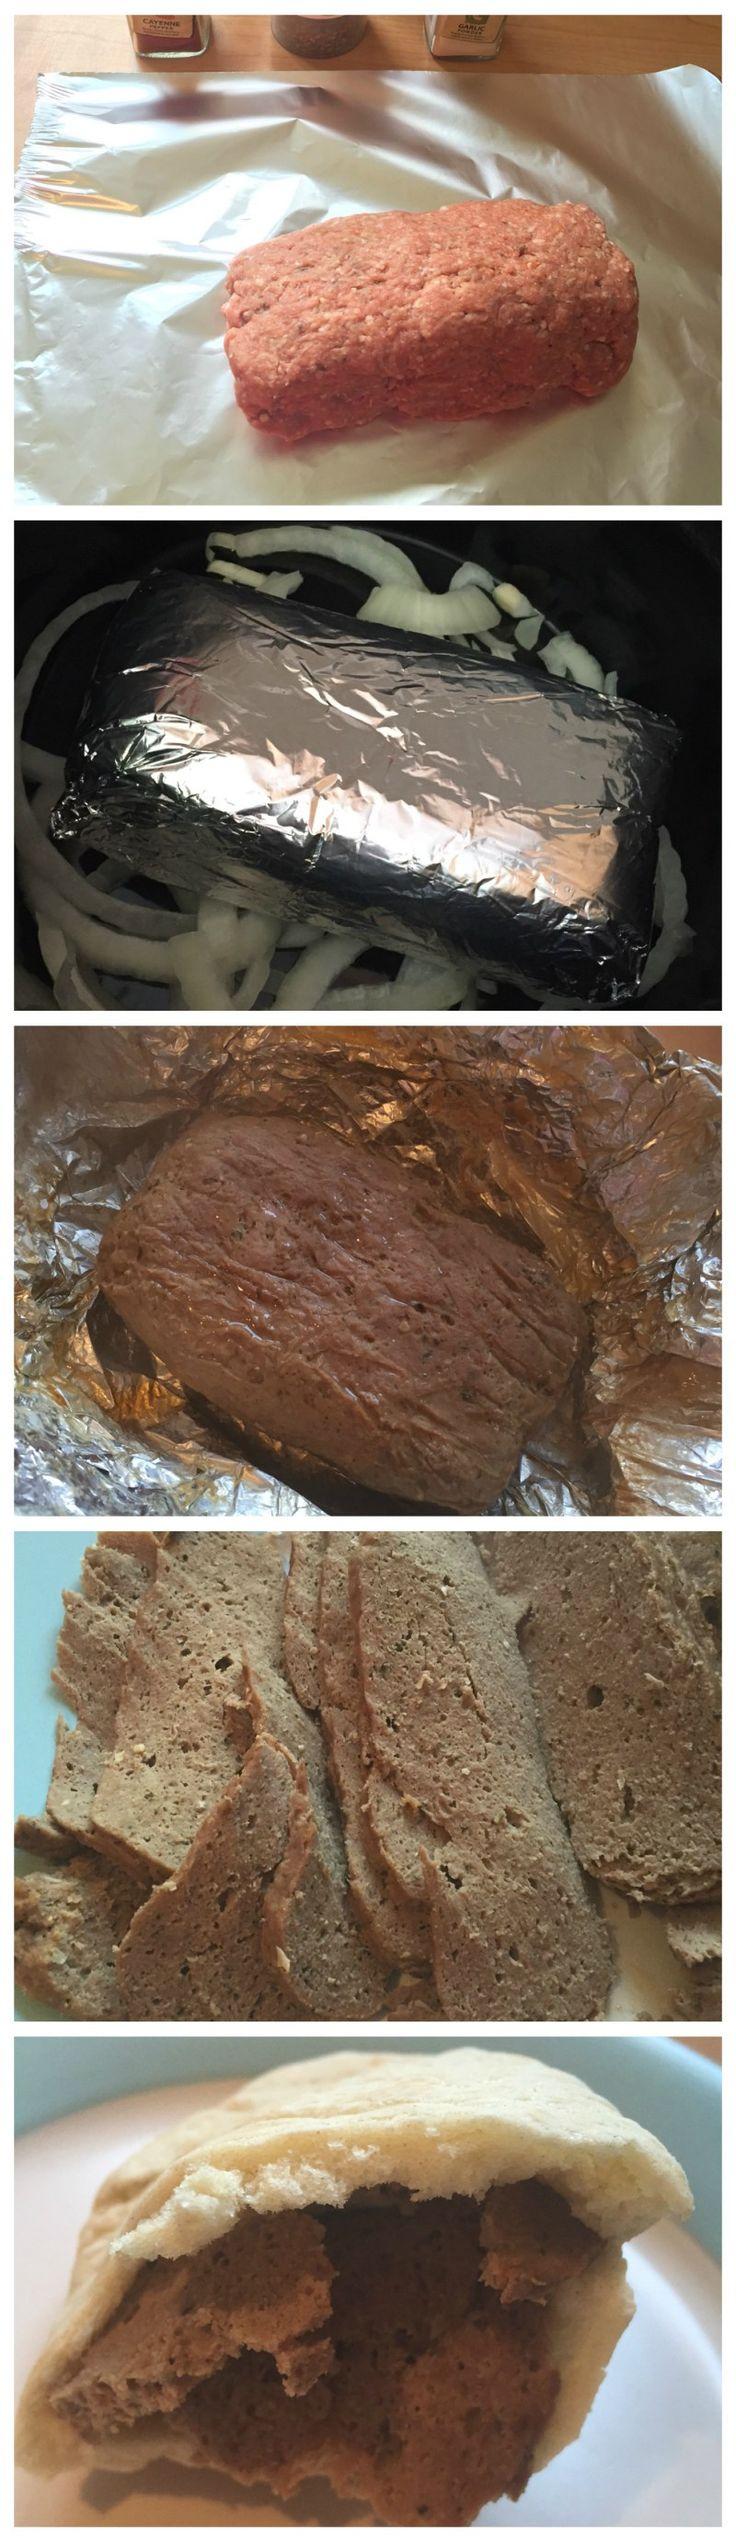 Homemade Doner Kebab (Slow Cooker) (Slimming World) (Fakeaway)�